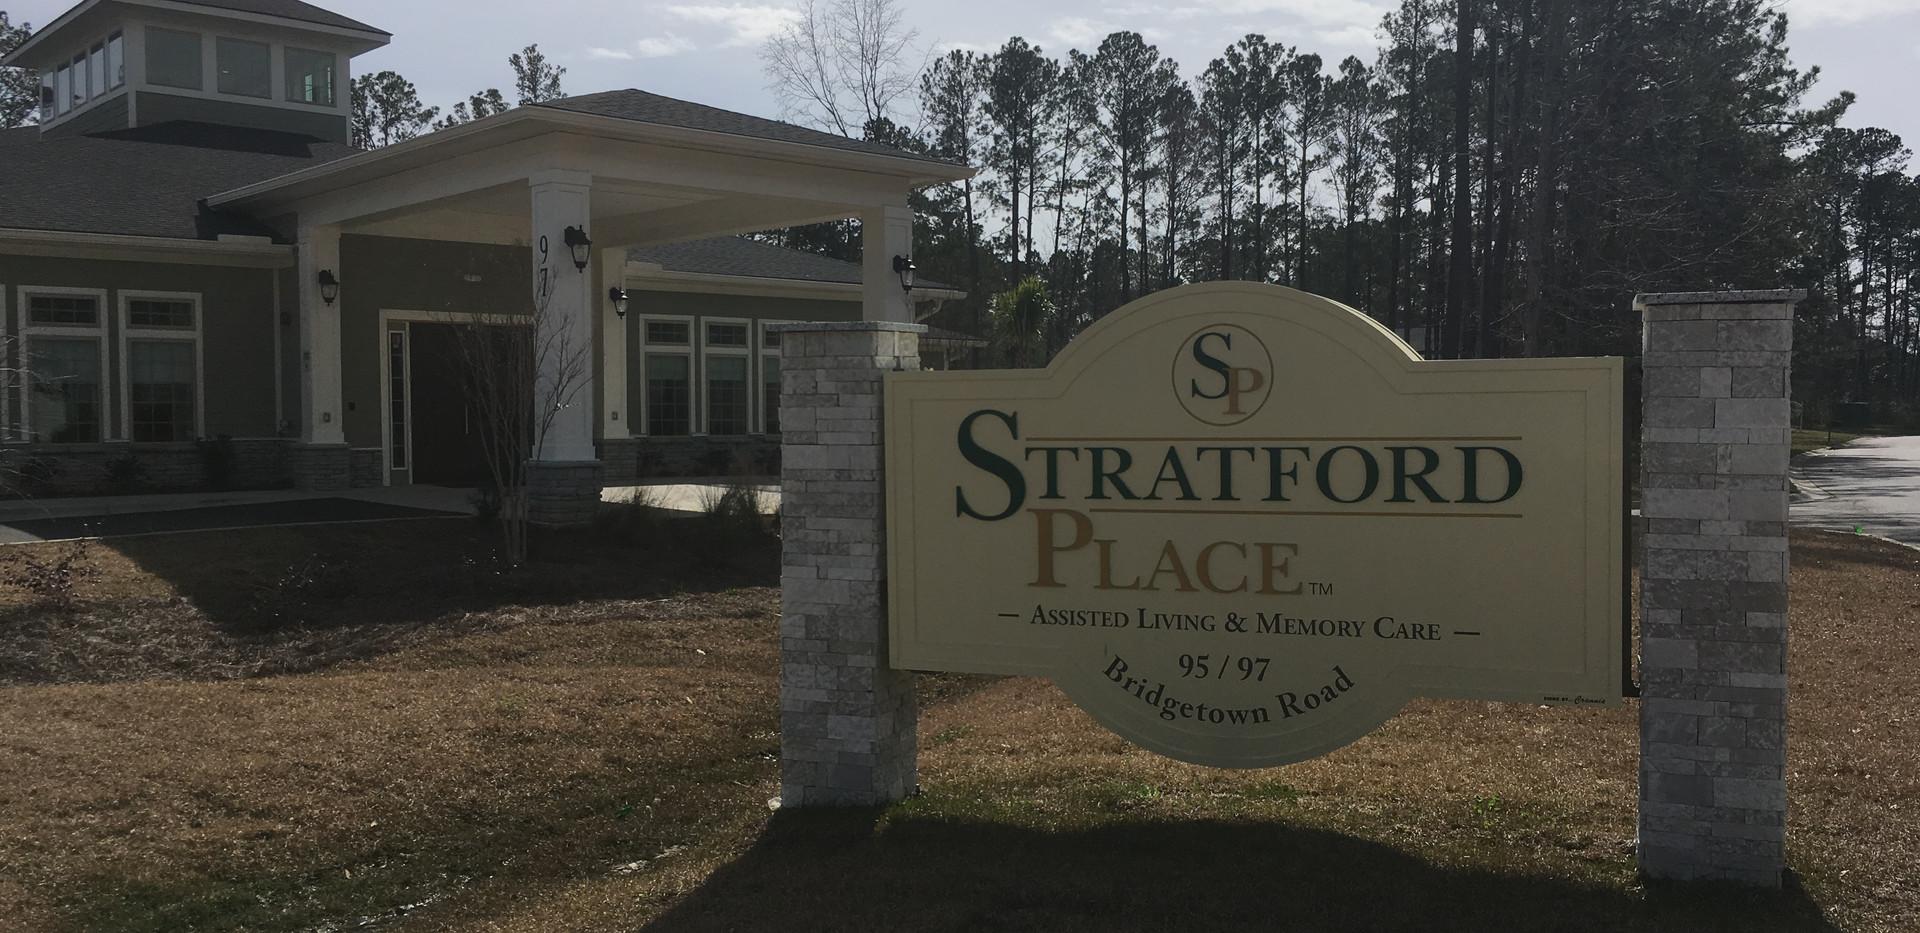 Stratford Place - Sign #1.JPG